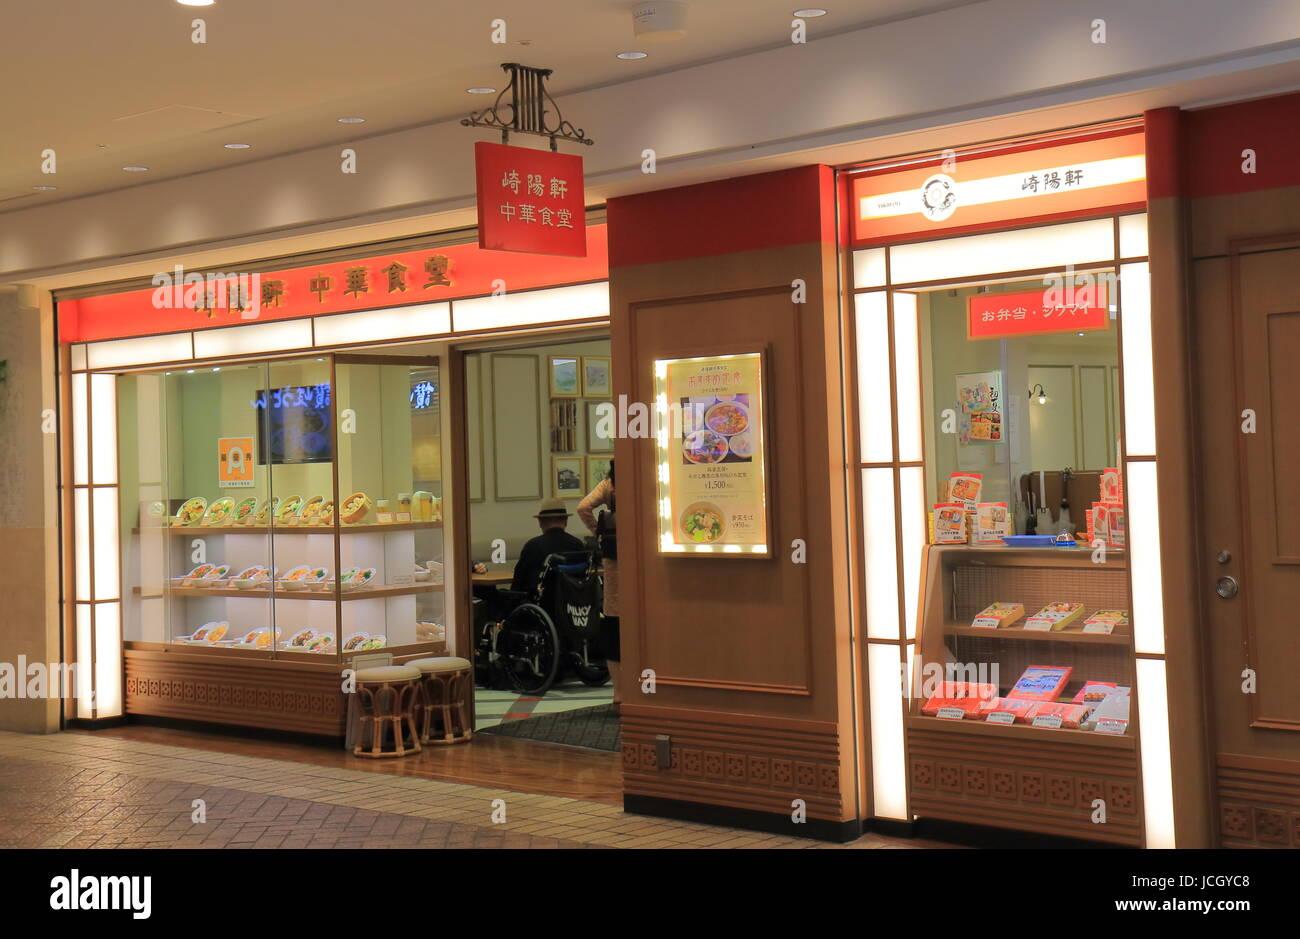 Kiyouken Restaurant in Yokohama Japan besuchen Menschen. Kiyouken ist der berühmteste Shop von Shuumai, chinesischen Stockbild